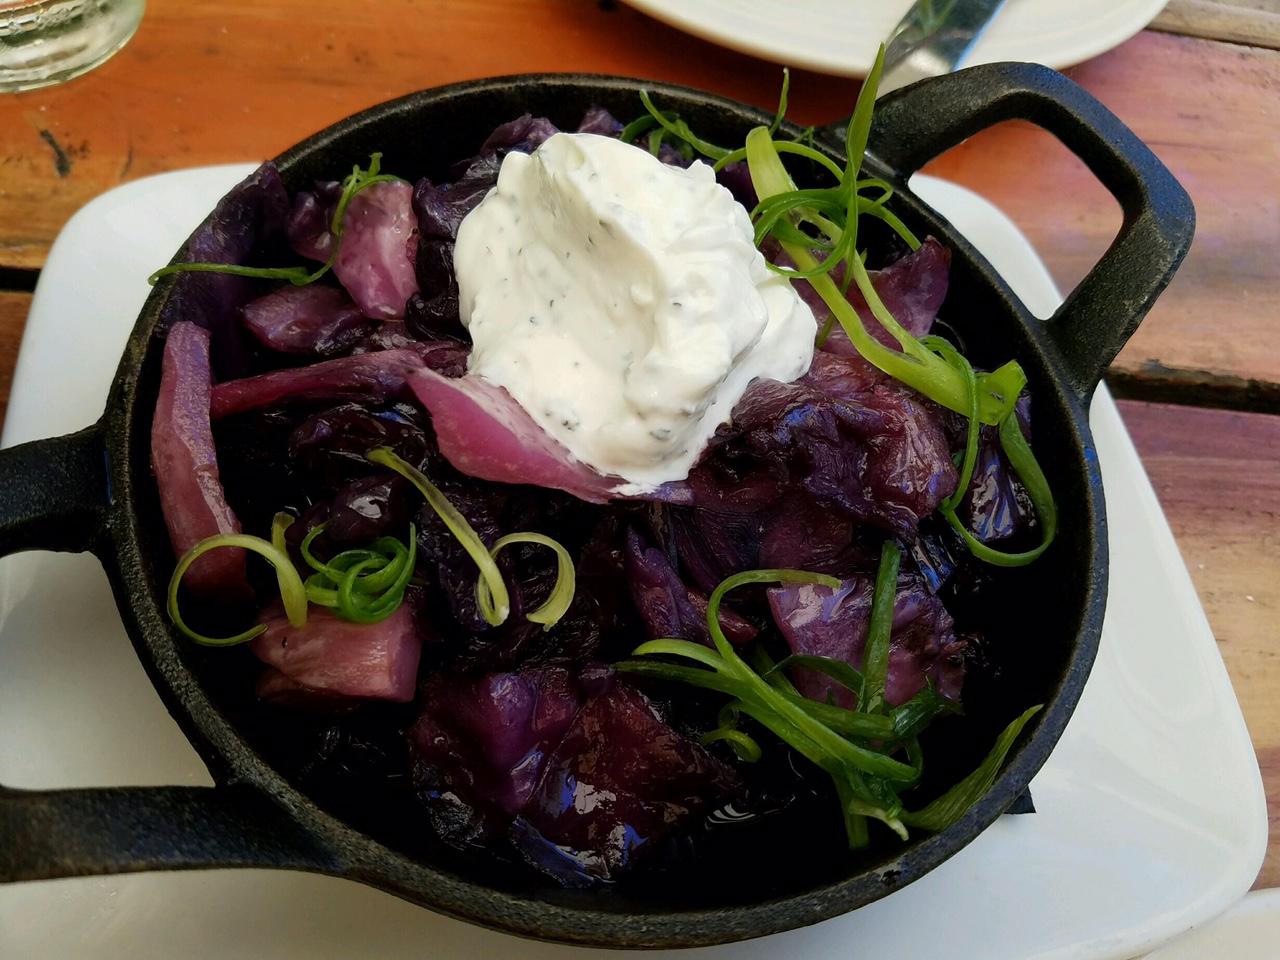 Smoked purple cabbage. Unique and delicious!